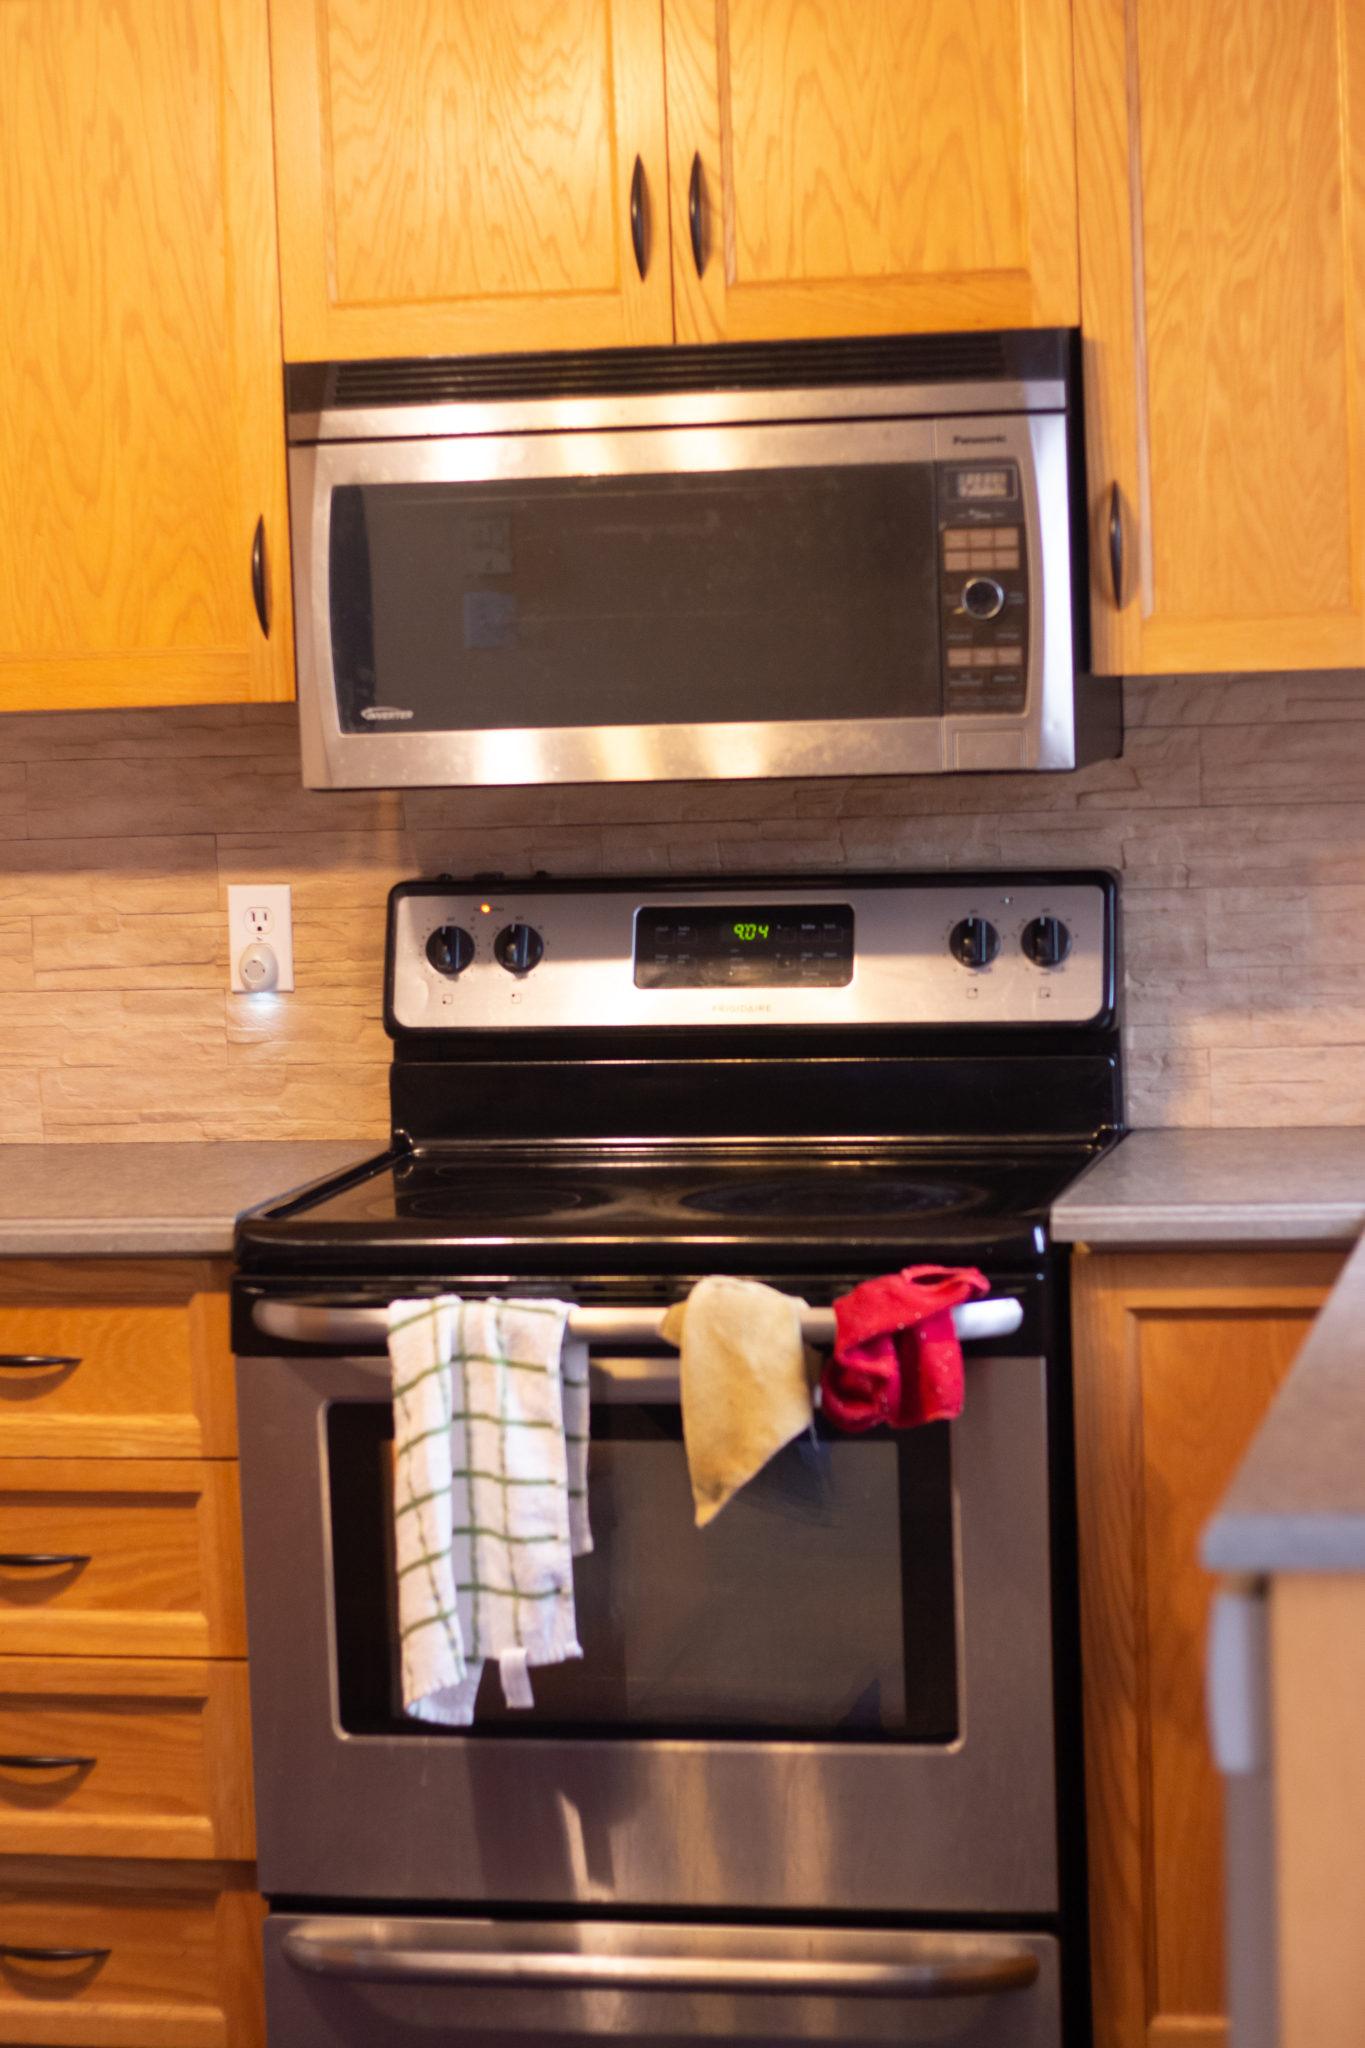 Grateful Sunday: Kitchen Renovations Woes